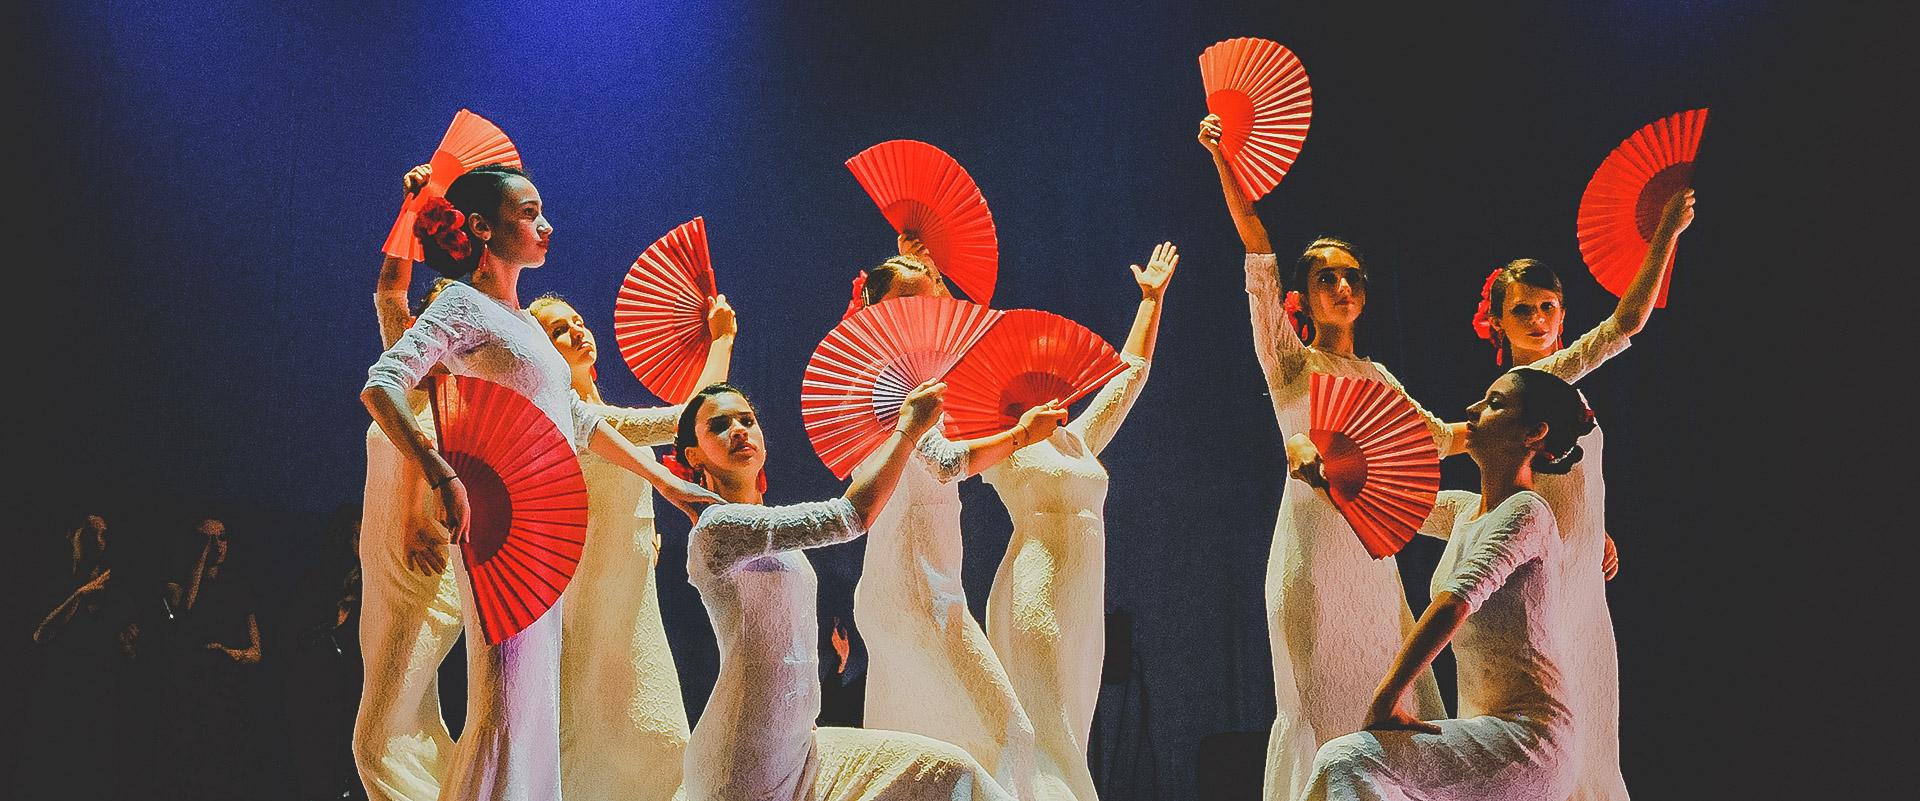 cours_flamenco_ados_toulouse